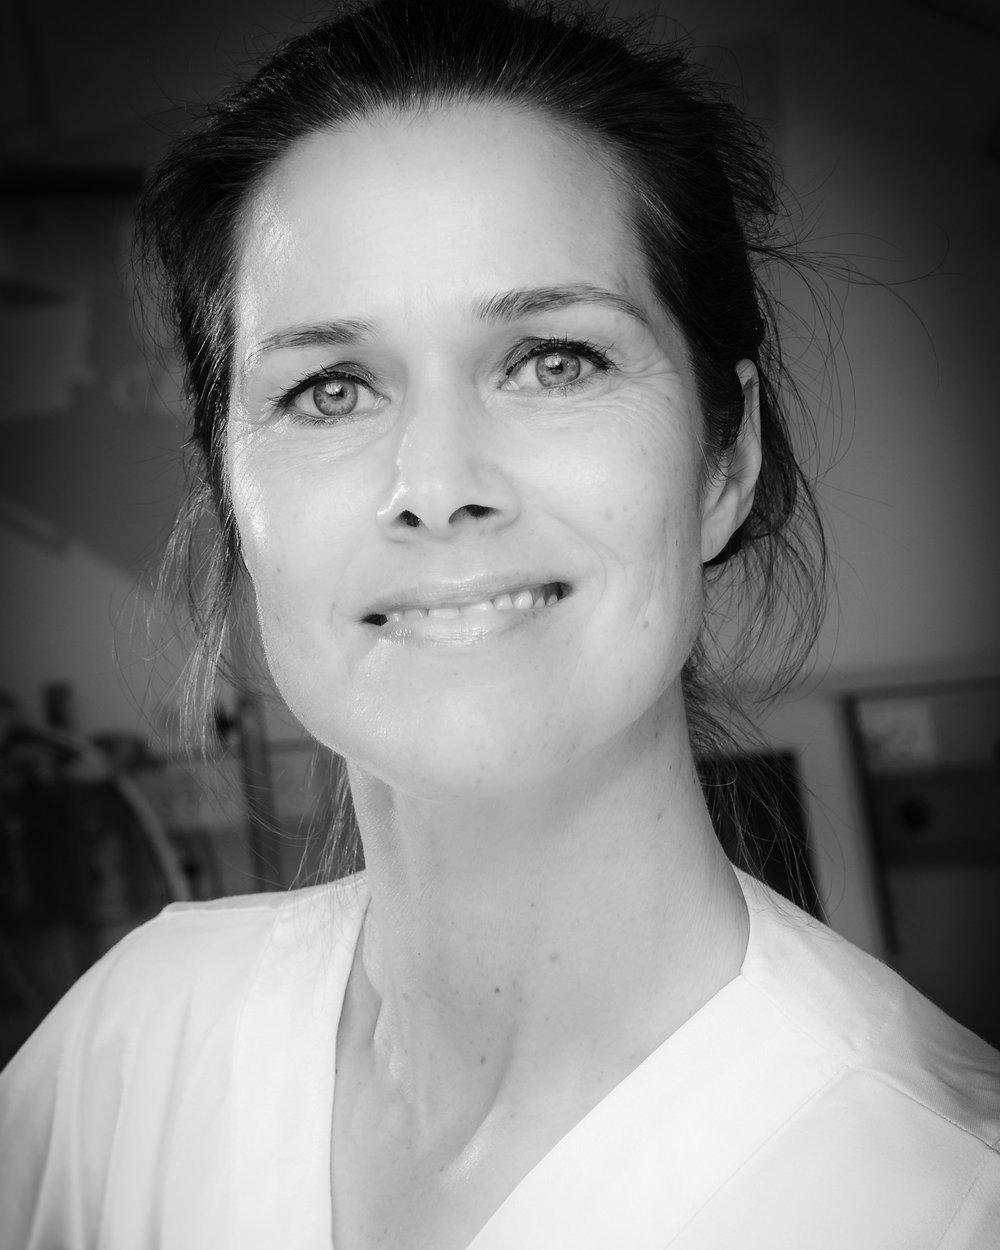 Malene Hegenberger - Certified Nurse Midwife+45 5354 4664malene@hegenbergerspeculum.com